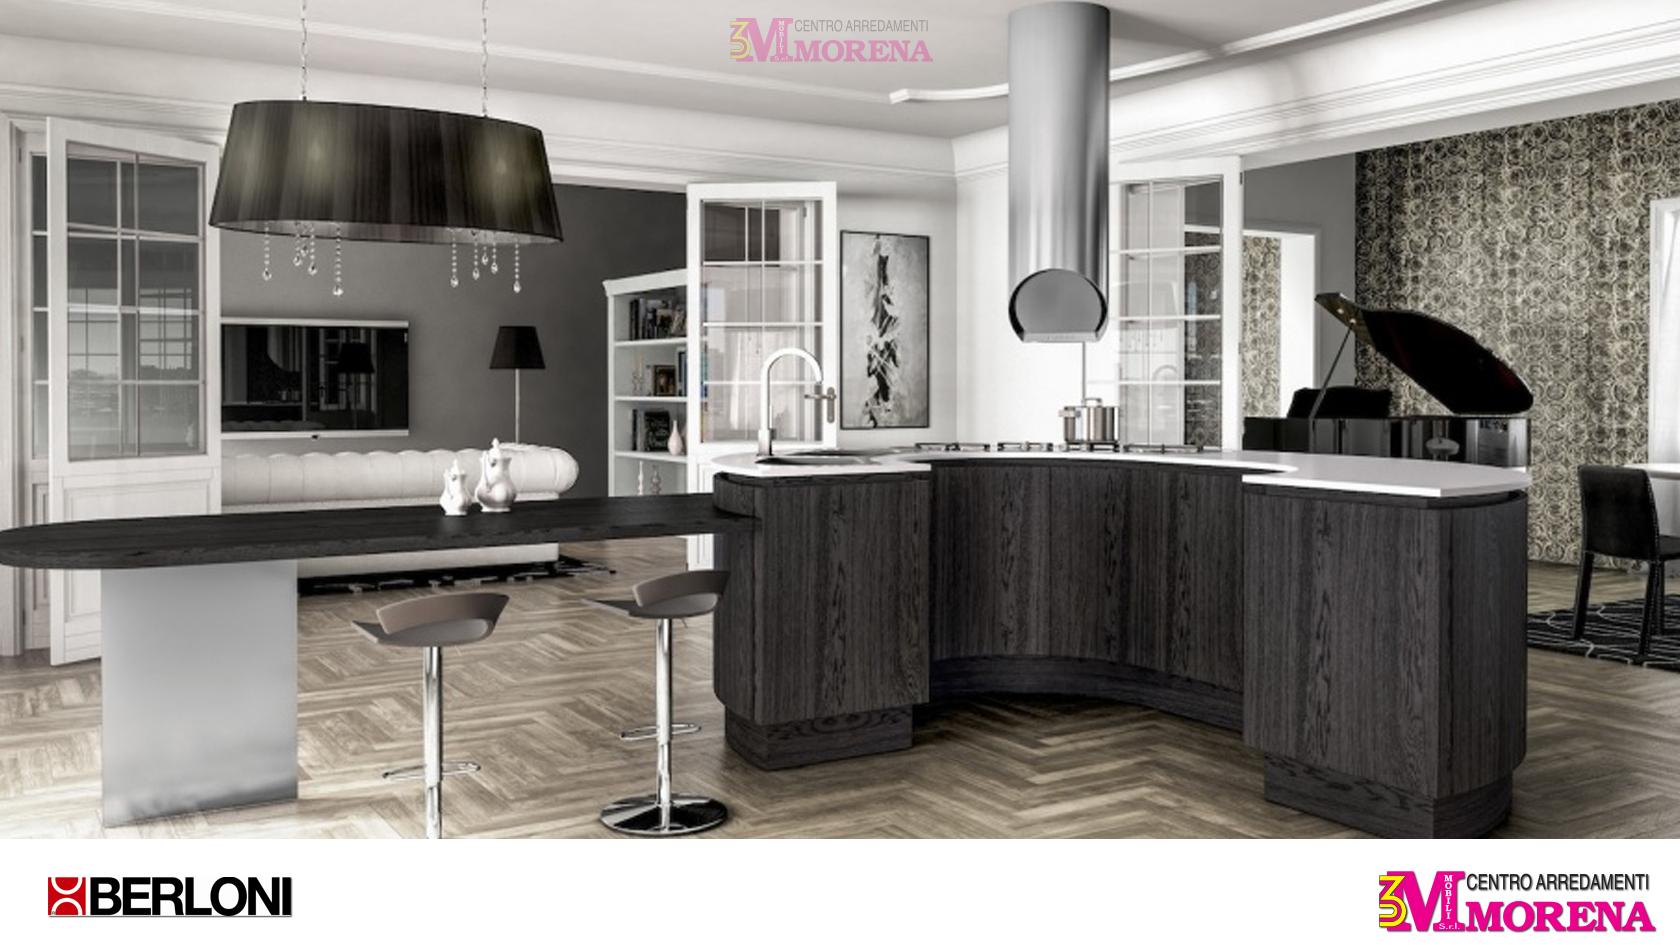 Cucina b50 - 3mmorena.it